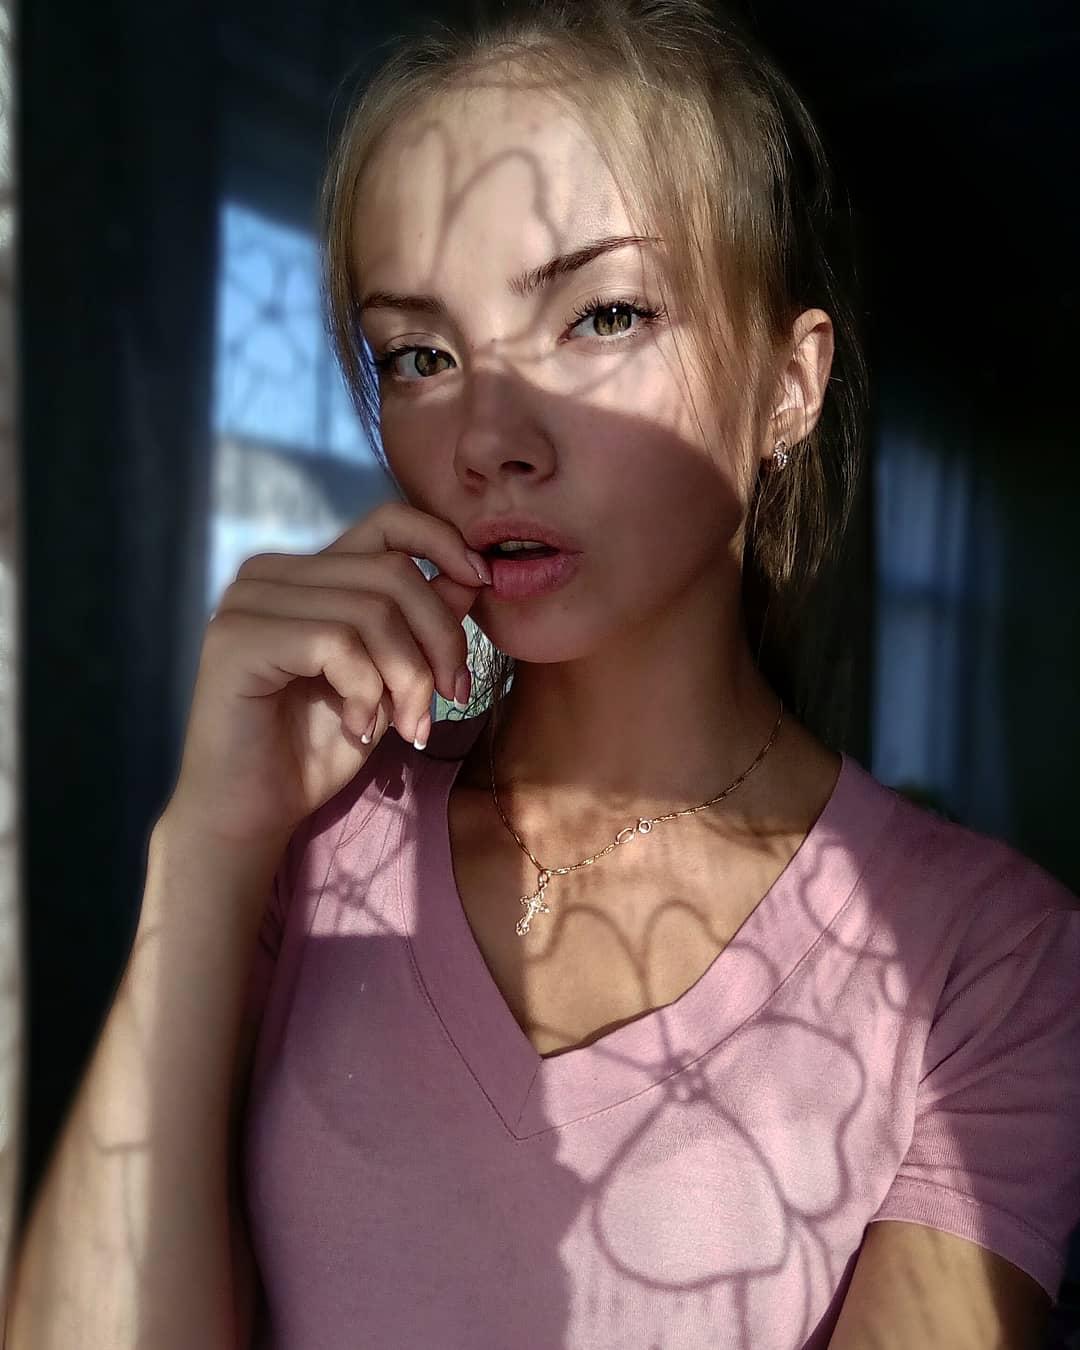 Anastasia-Fefilova-Wallpapers-Insta-Fit-Bio-13